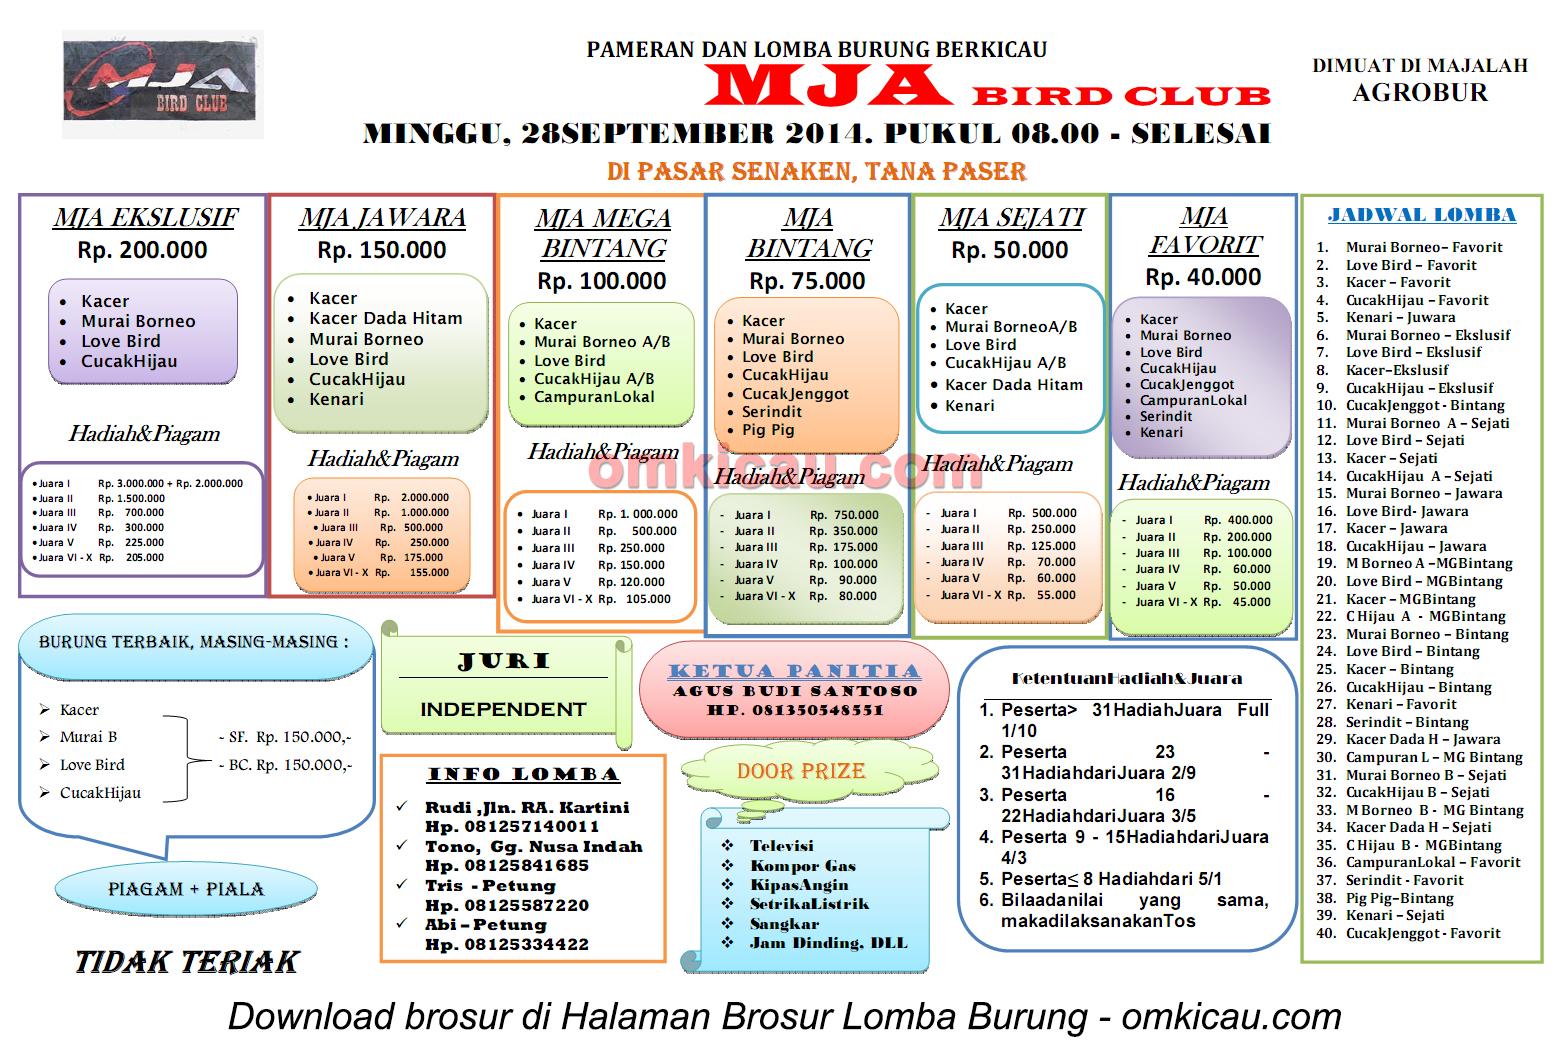 Brosur Lomba Burung Berkicau MJA BC, Tana Paser, 28 September 2014